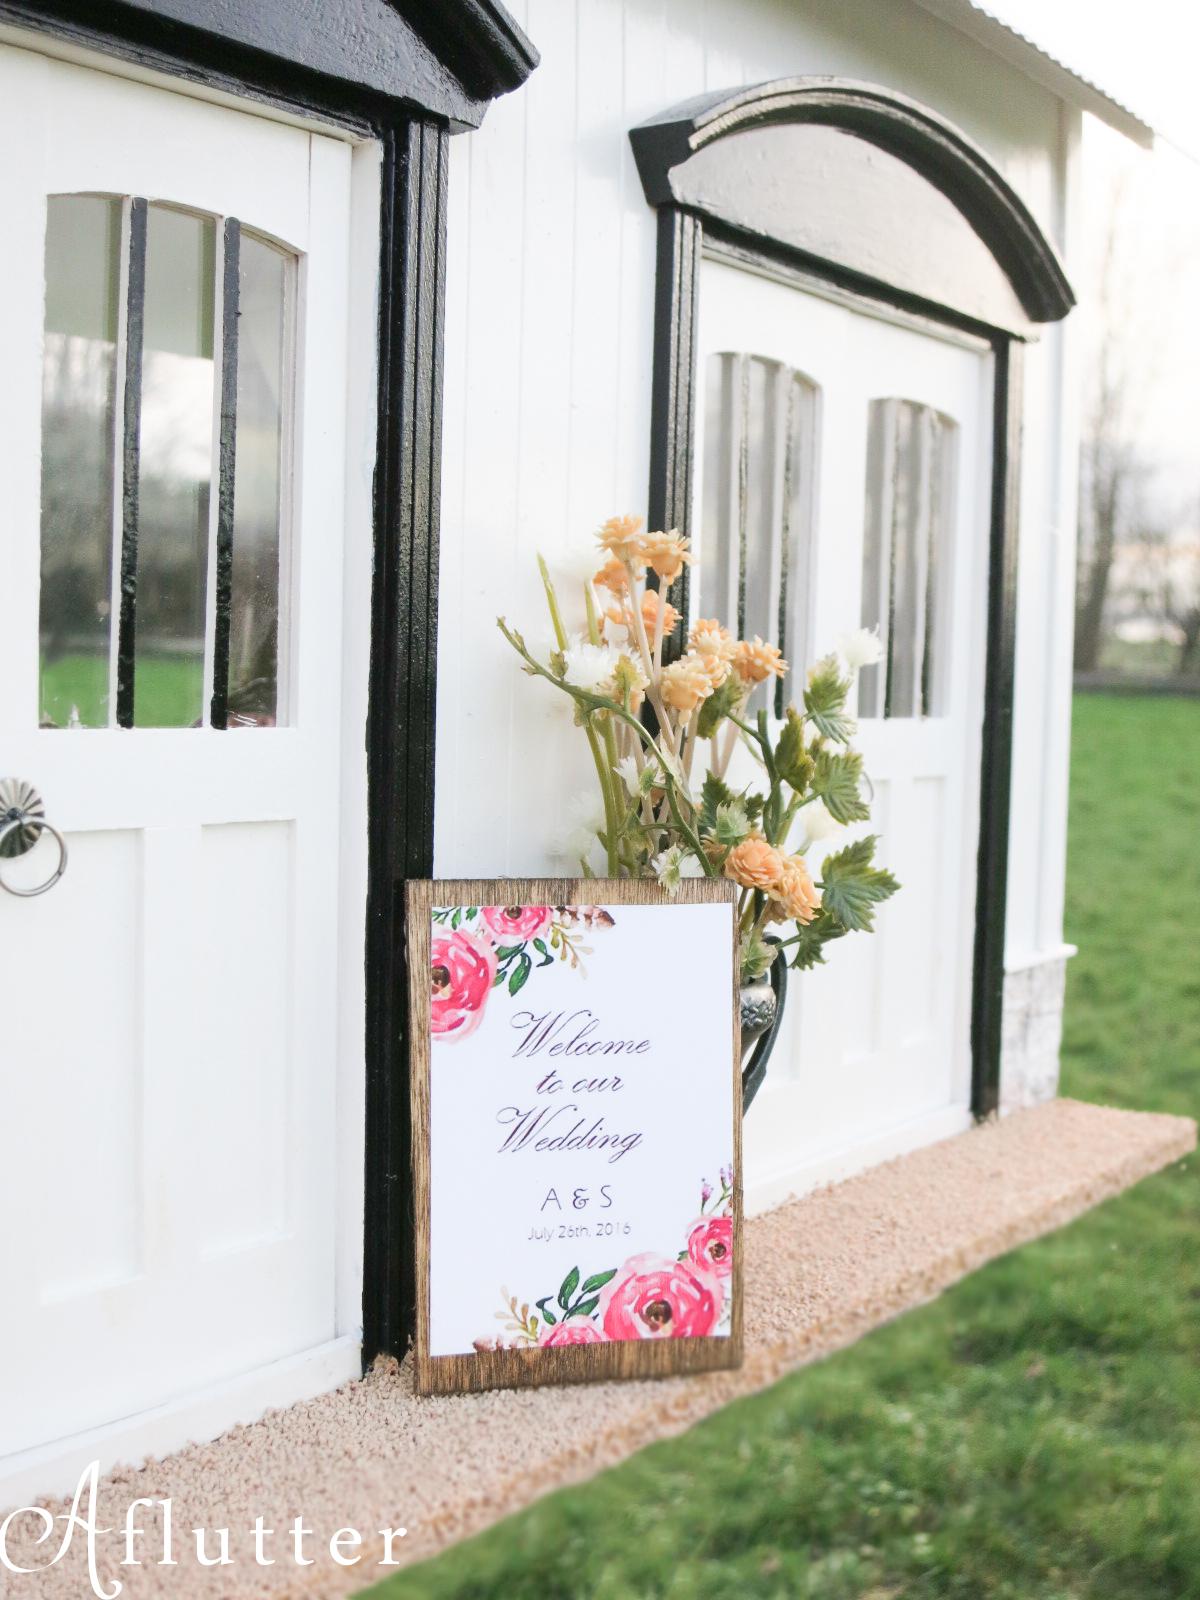 Brenul-Barn-Mini-Wedding-8-of-16.jpg